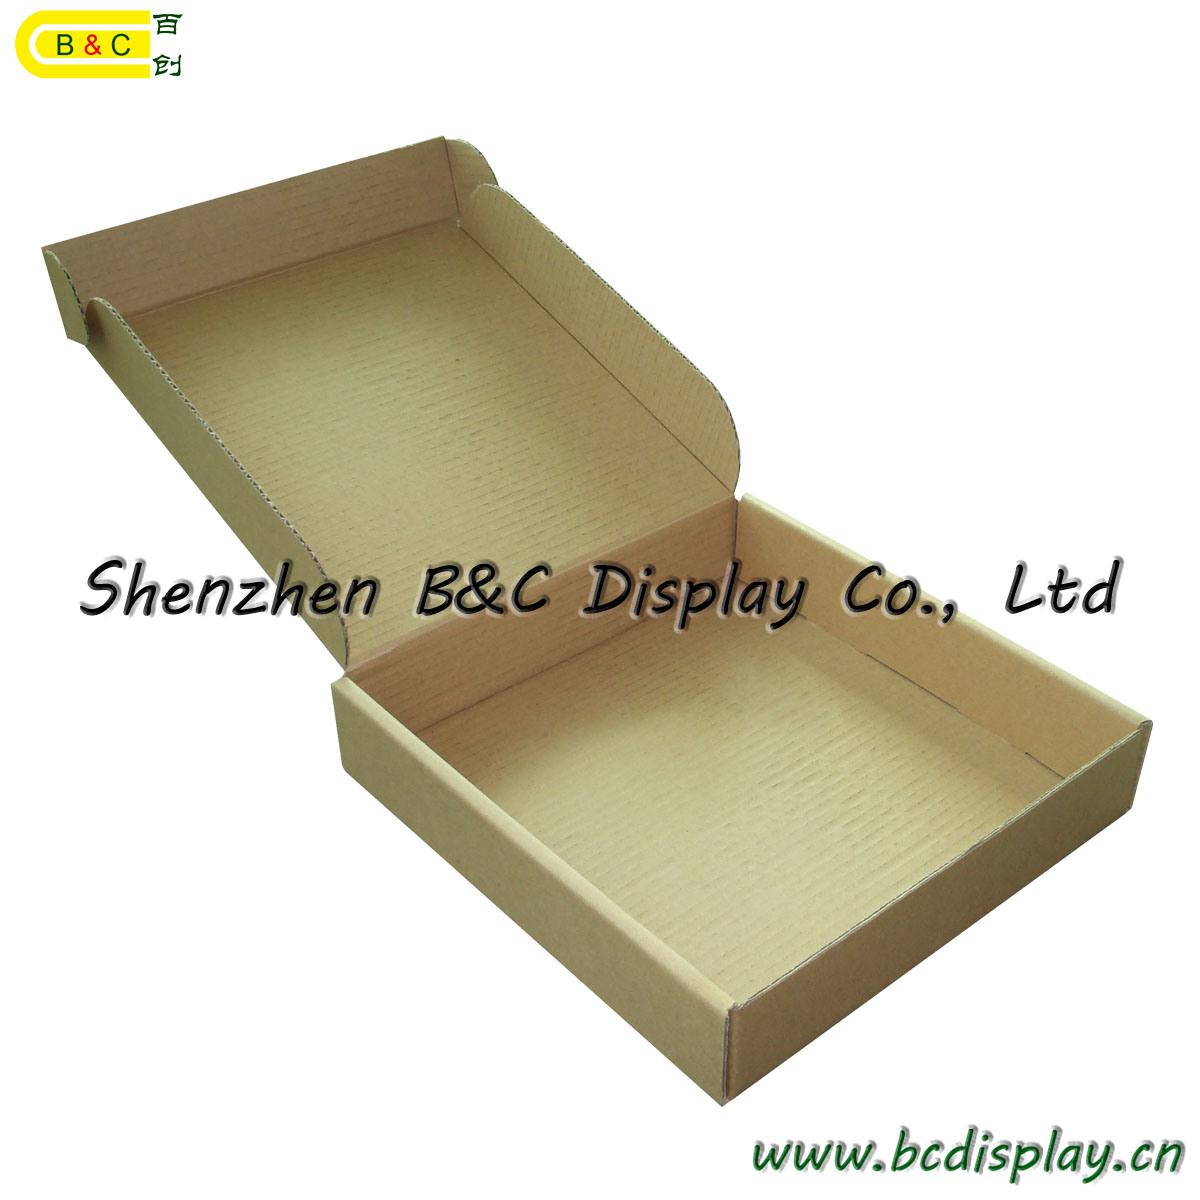 Beer Box, Carton Box, Folding Paper Box, Set-up Box, Folding Carton, Packaging Box (B&C-I024)